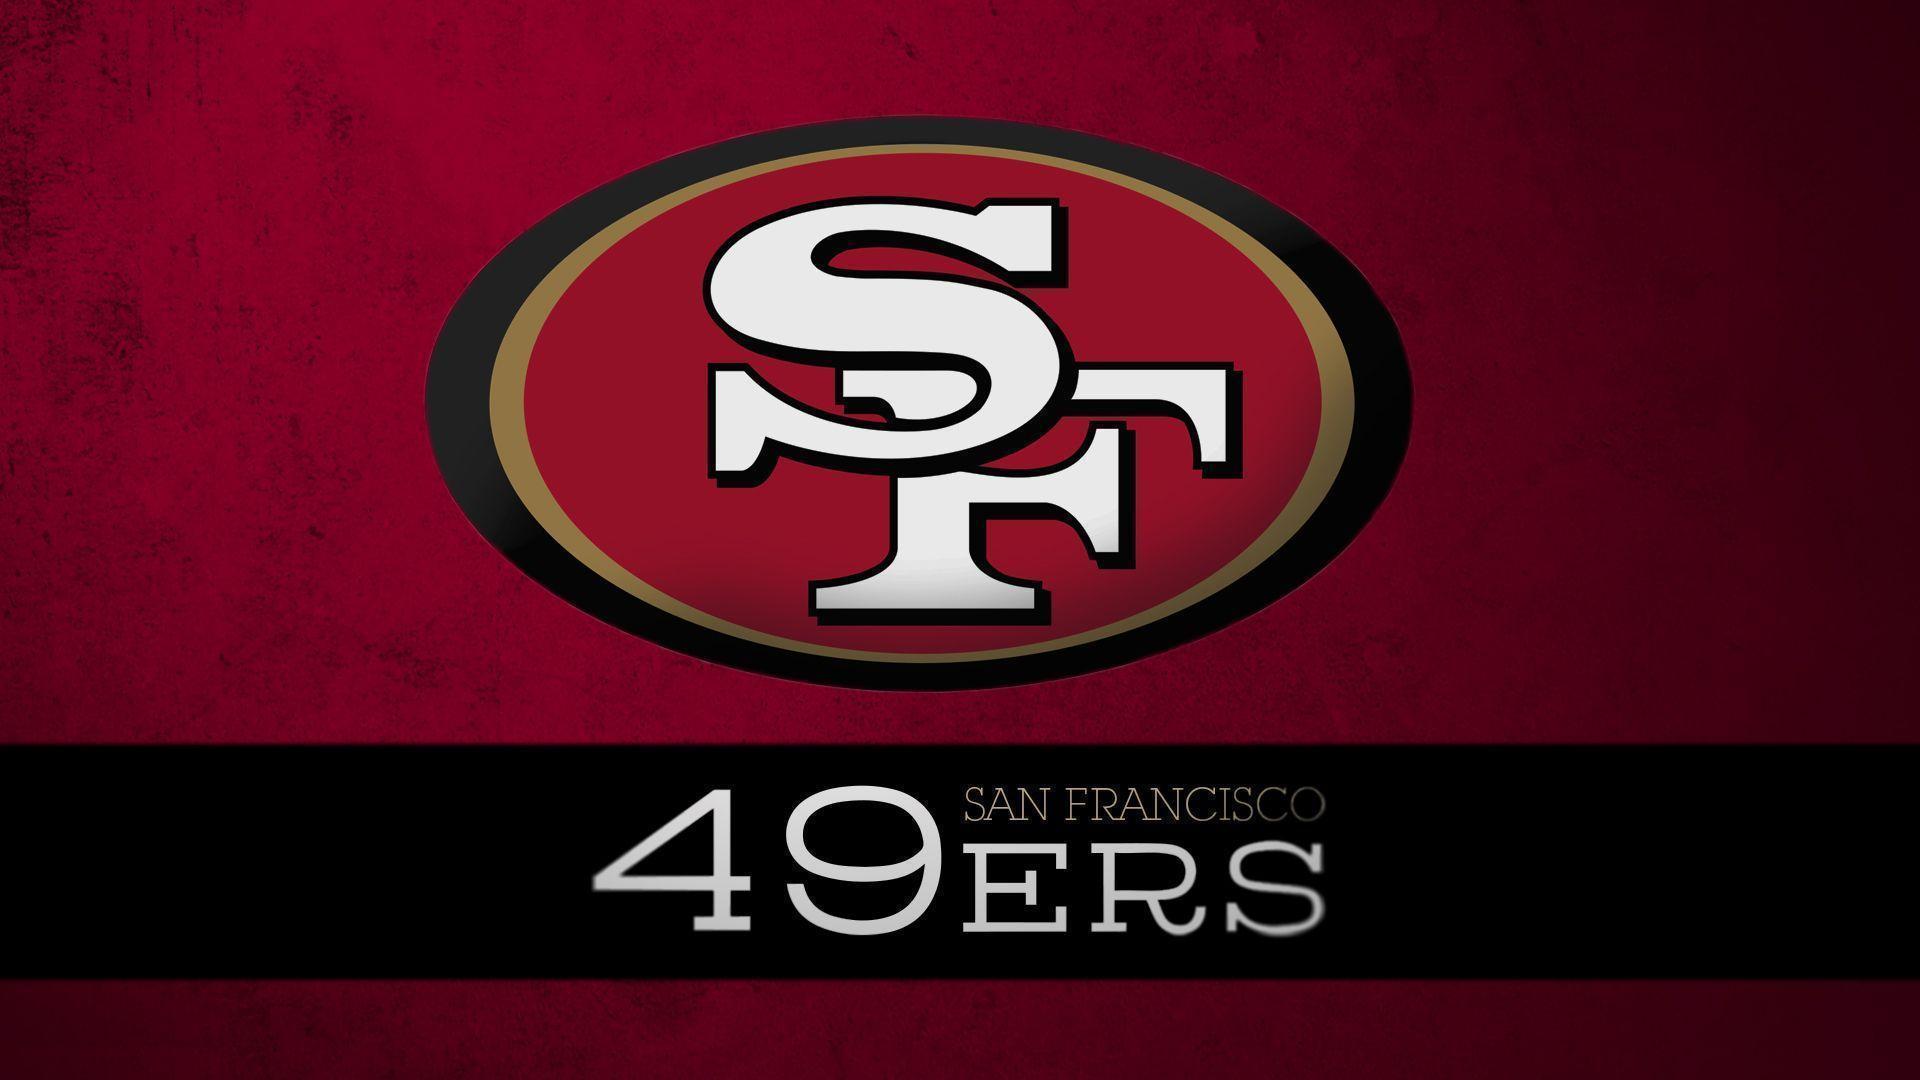 San Francisco 49ers Wallpaper - san francisco 49ers wallpaper logo .